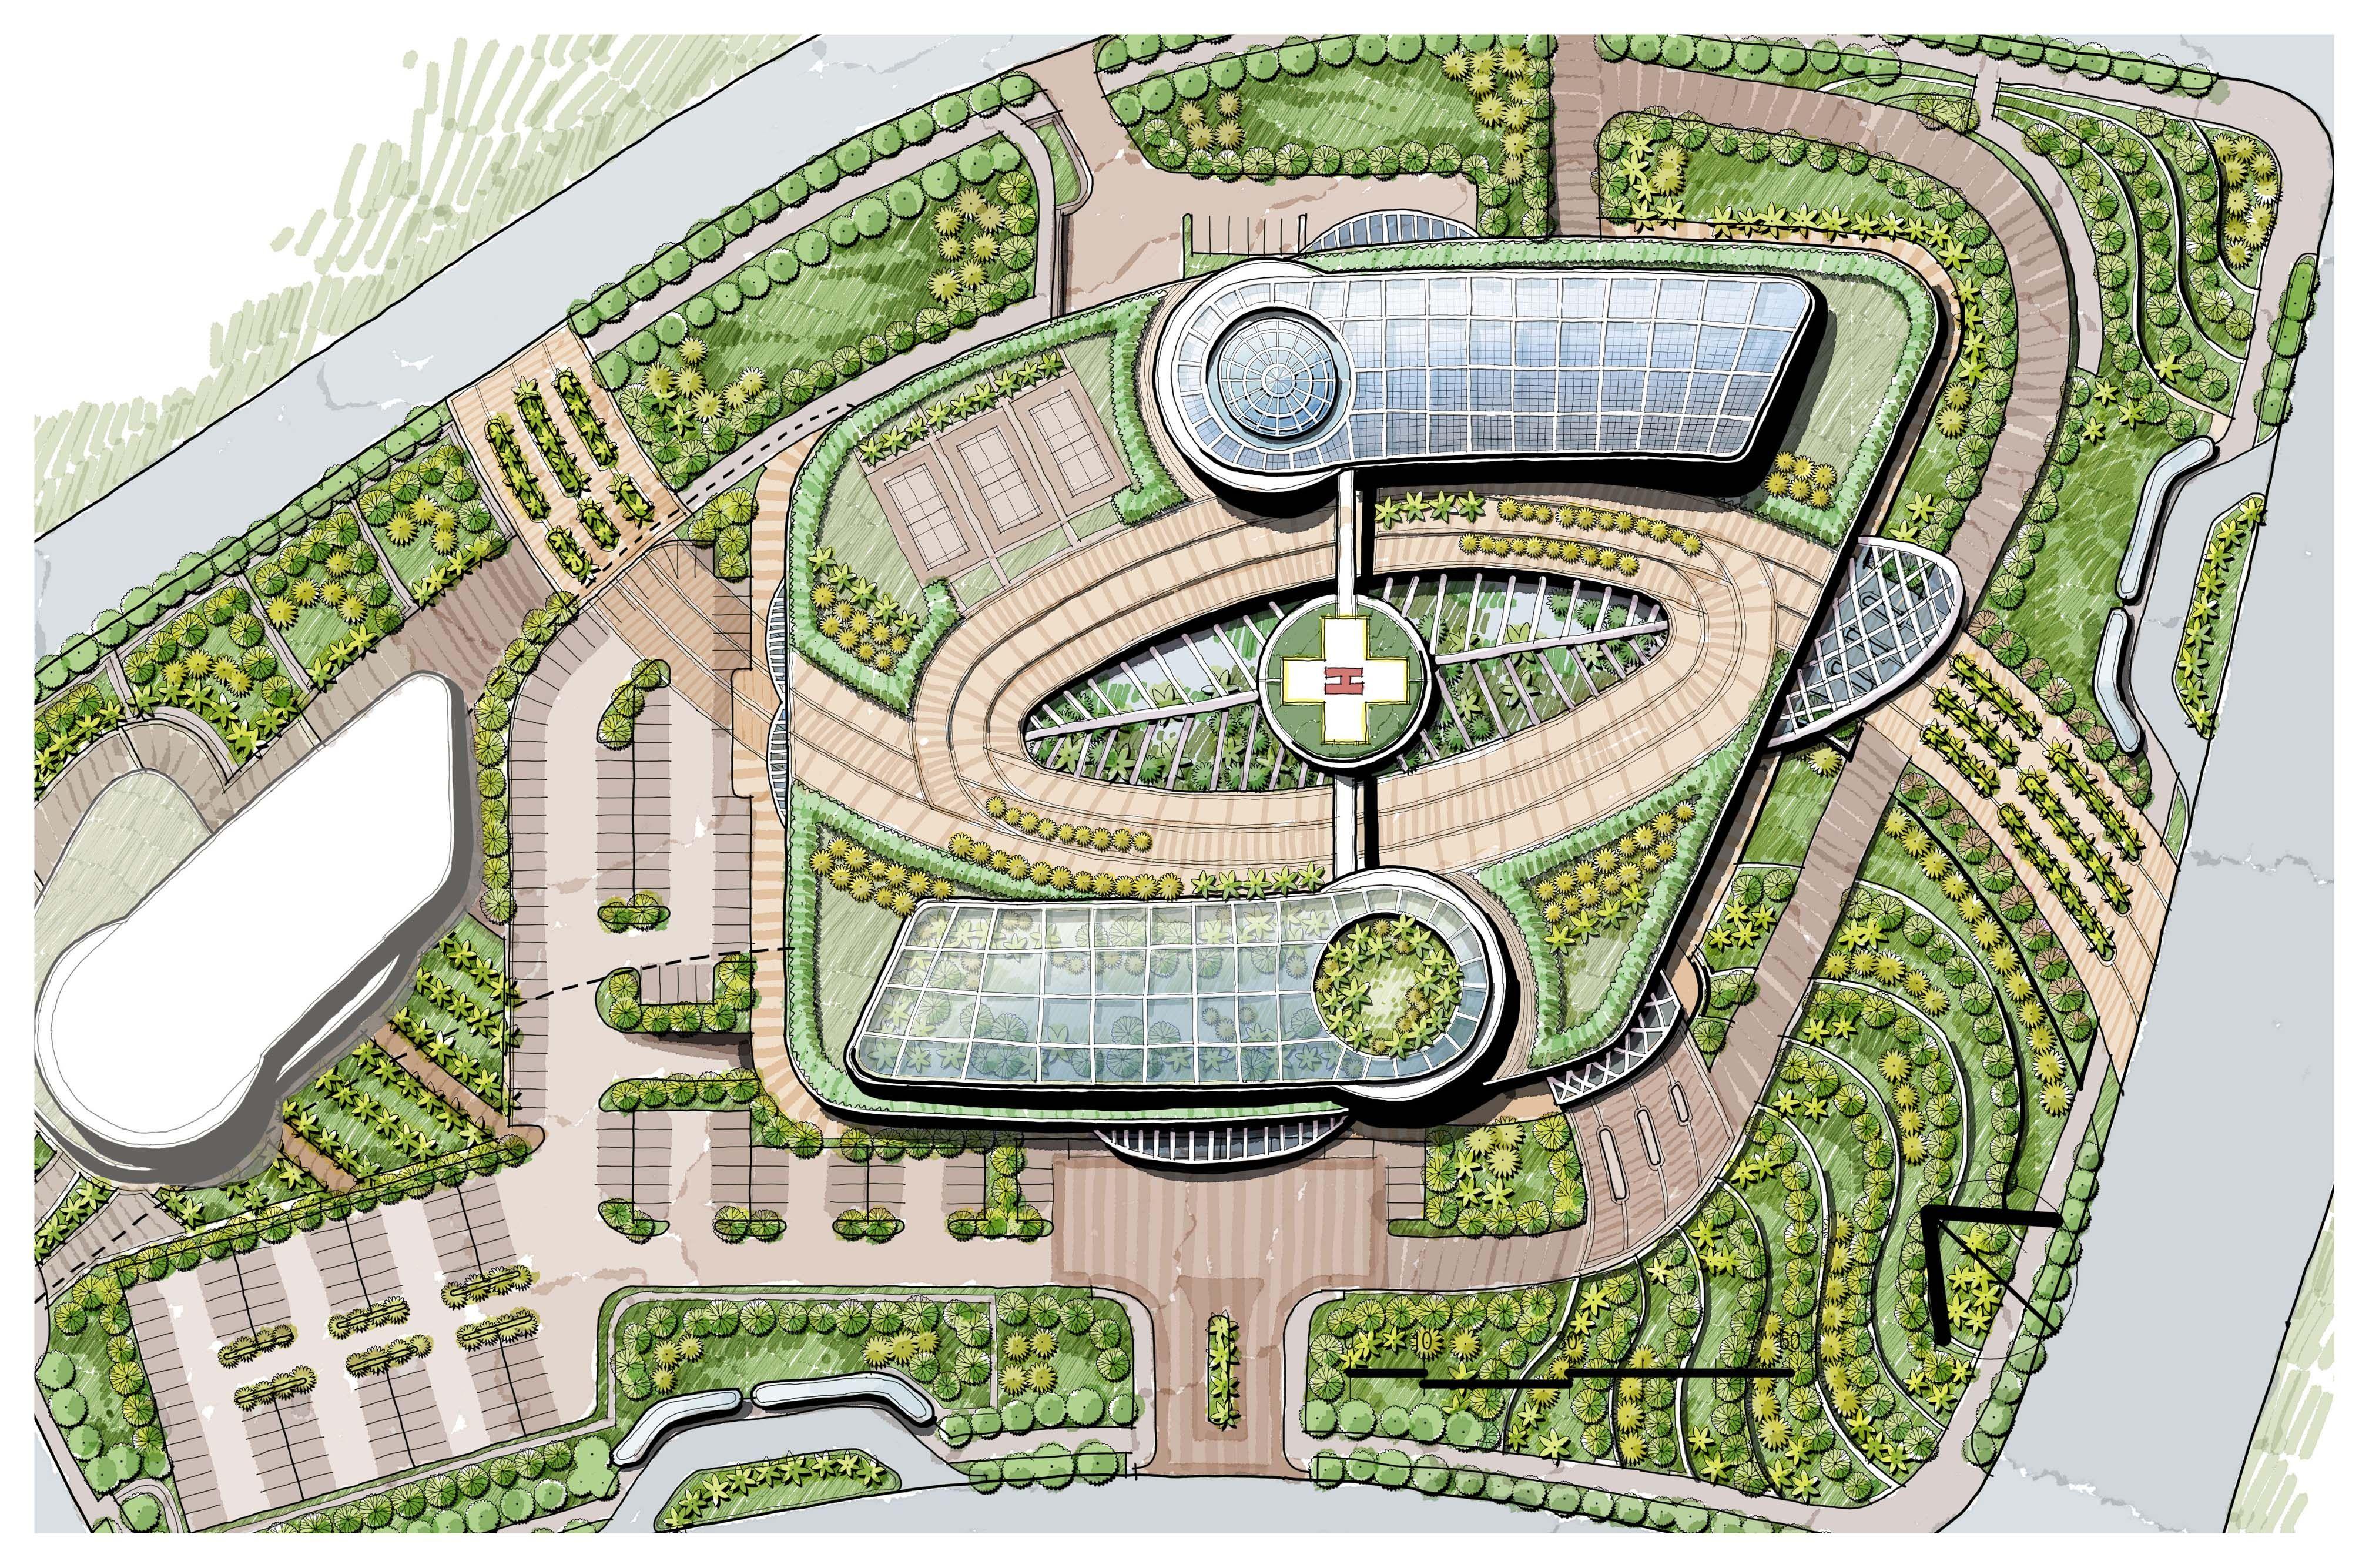 modern landscape master plan, sunken garden, green house, hospital